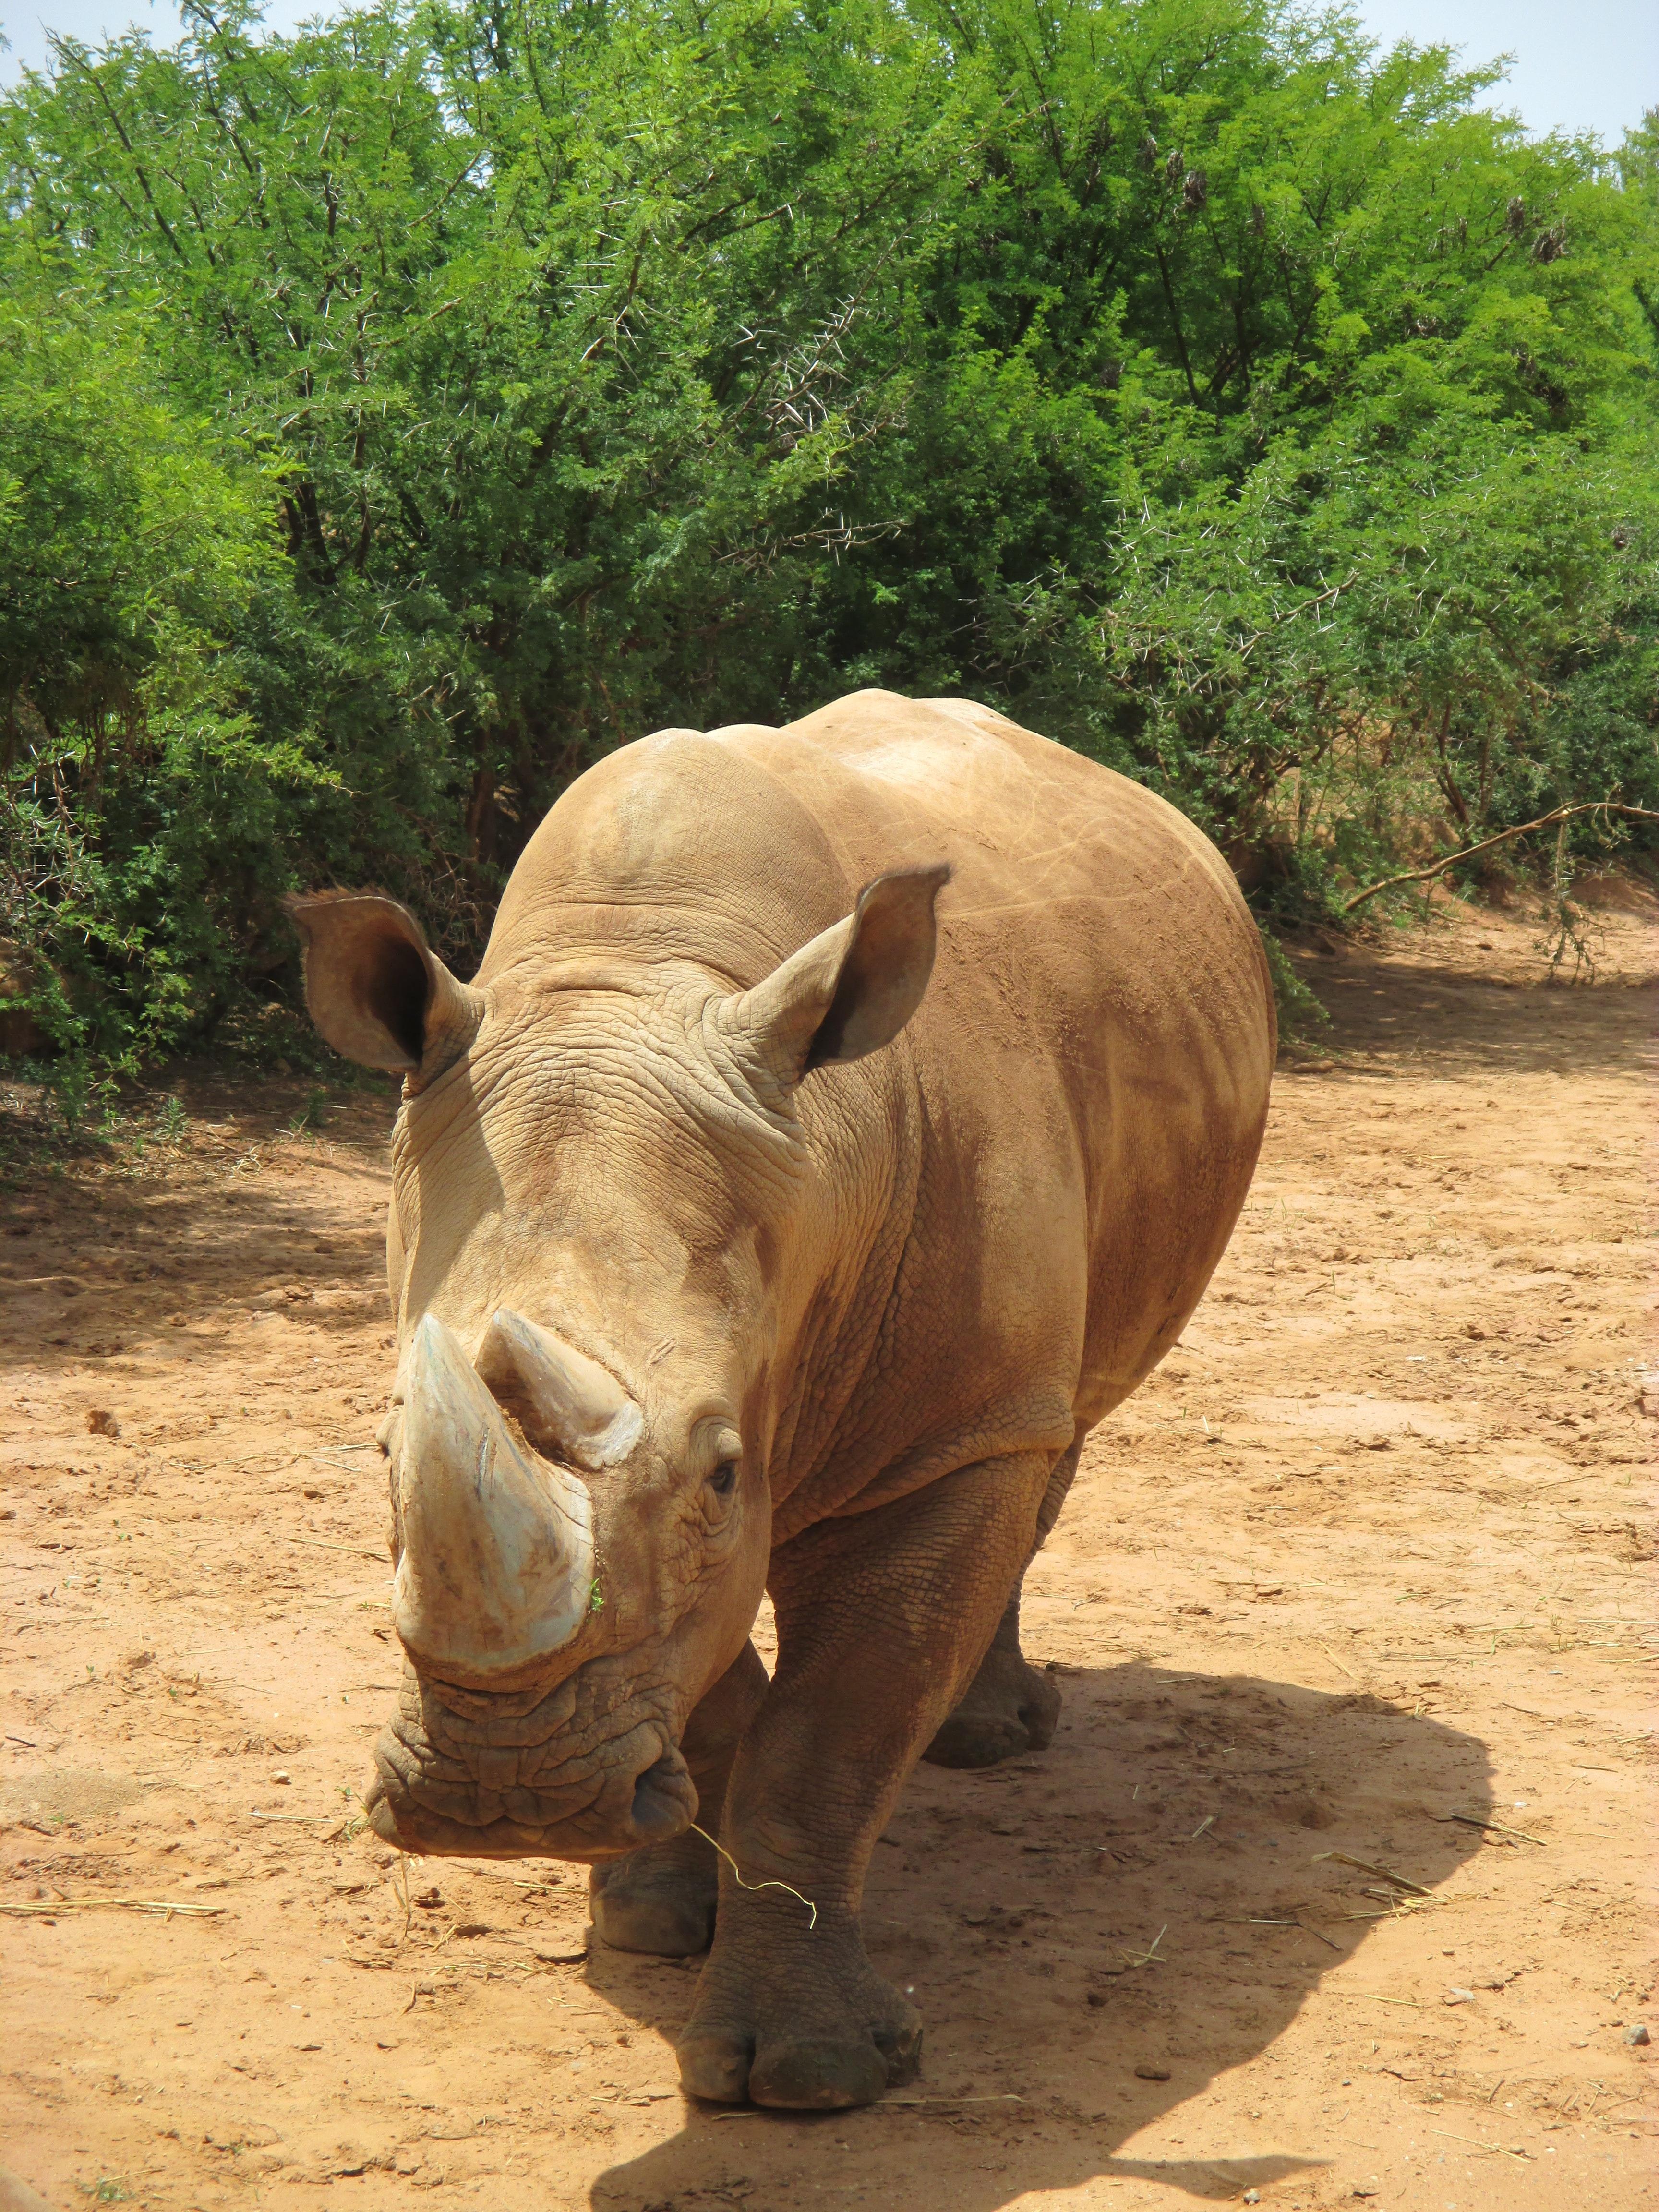 free images : animal, wildlife, zoo, africa, park, fauna, savanna